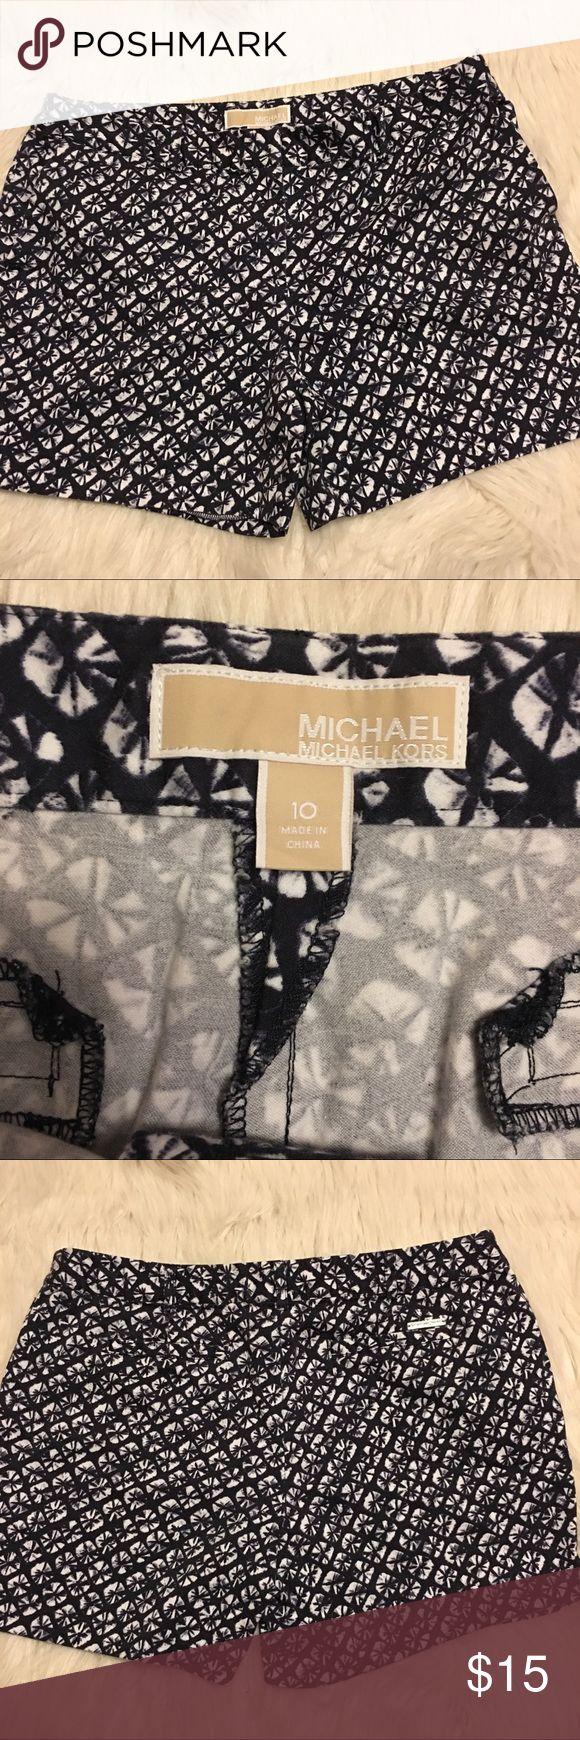 MICHAEL Michael Kors Printed Shorts Size 10,  cute Printed shorts, navy blue/white MICHAEL Michael Kors Shorts